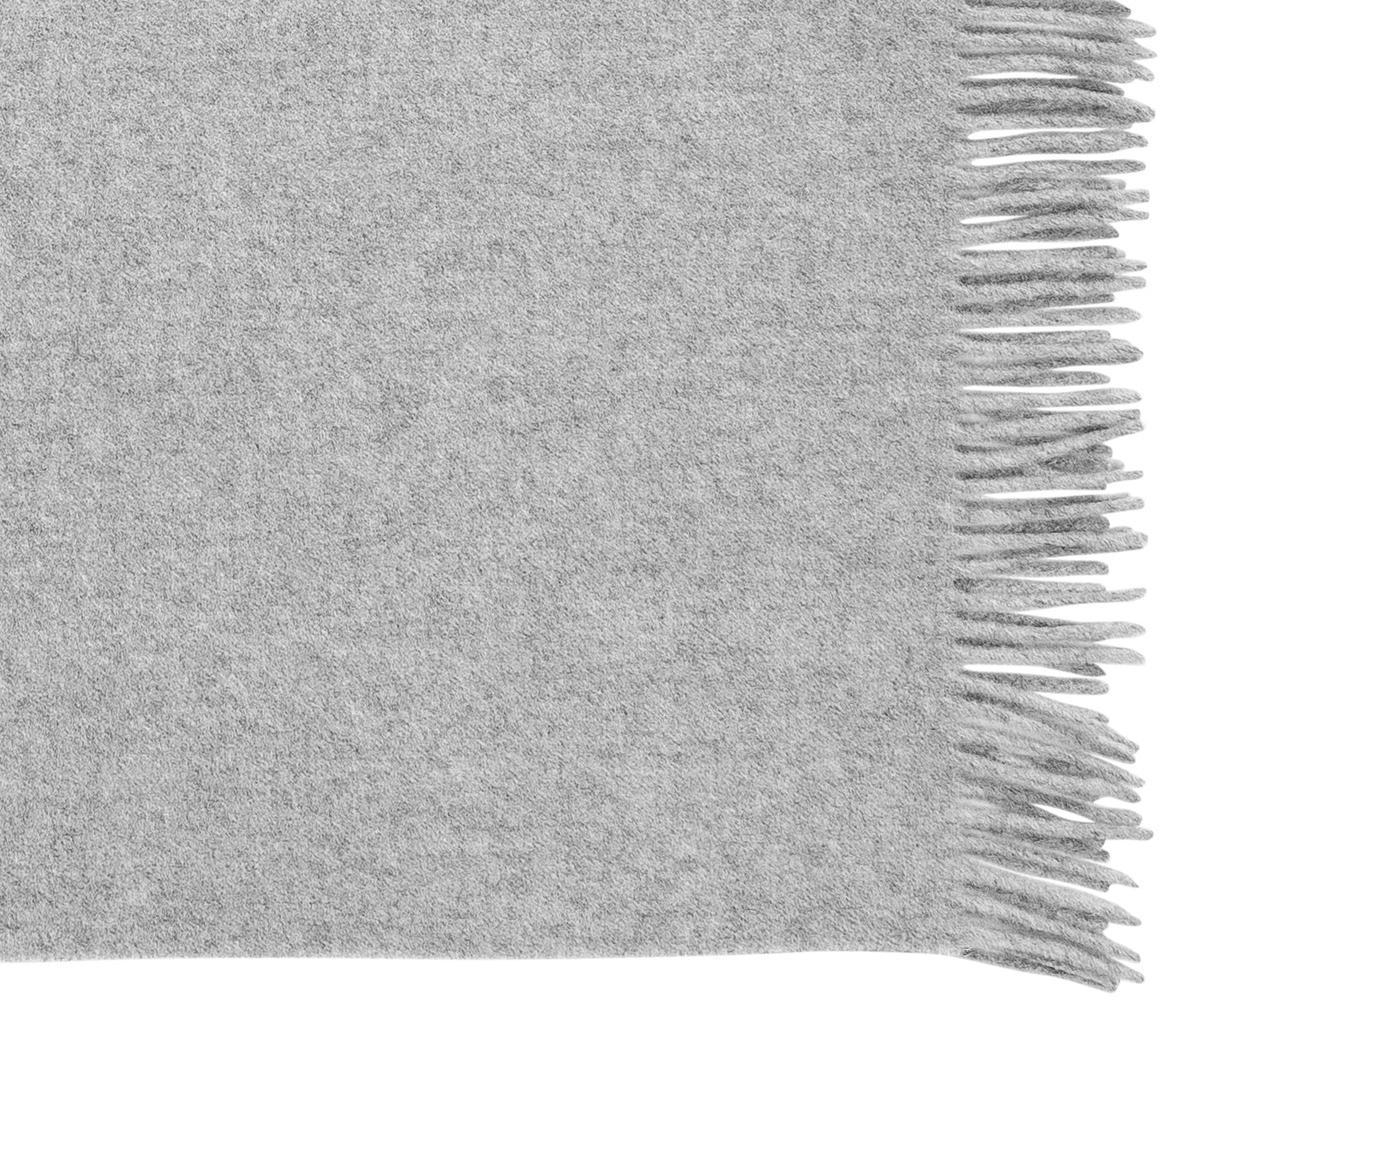 Plaid de lana Bella, gris - 130x170cm, 100% lana virgen, ligeramente áspera, Gris claro, An 130 x L 170 cm